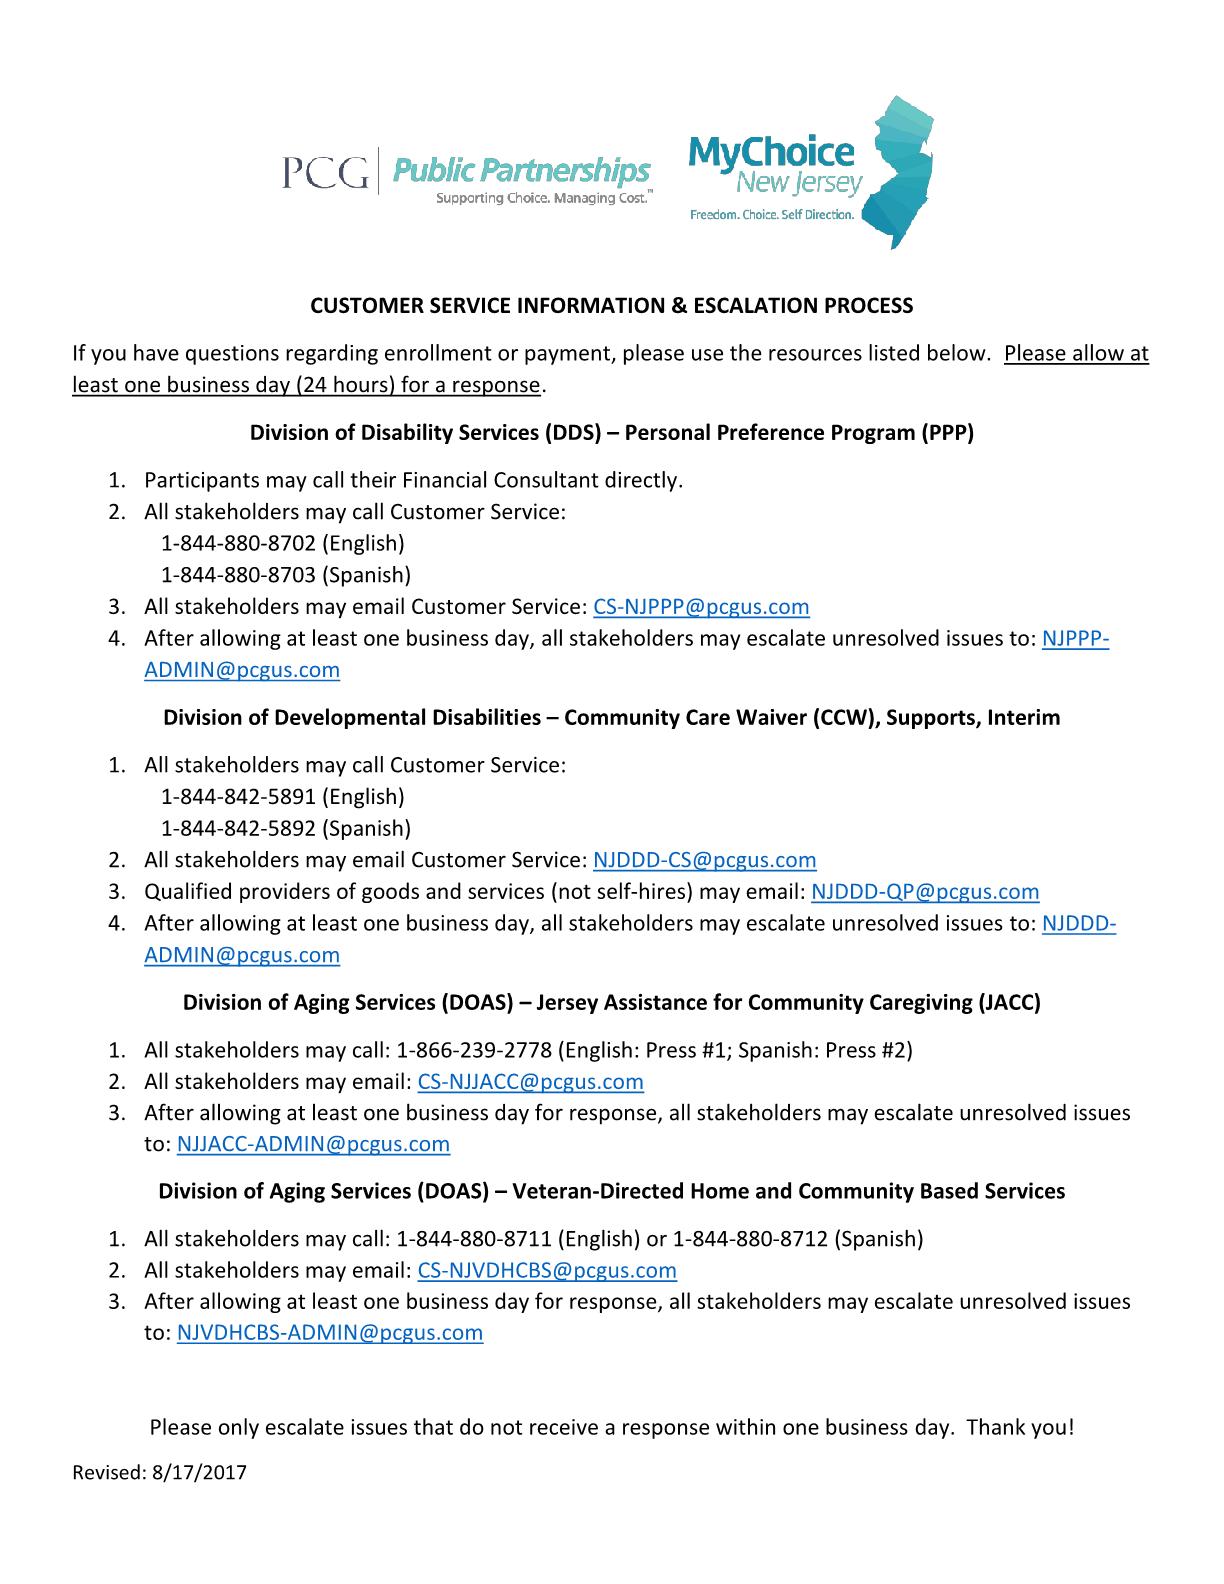 DDD Self-Directed Employee (SDE) - CUSTOMER SERVICE INFORMATION & ESCALATION PROCESS